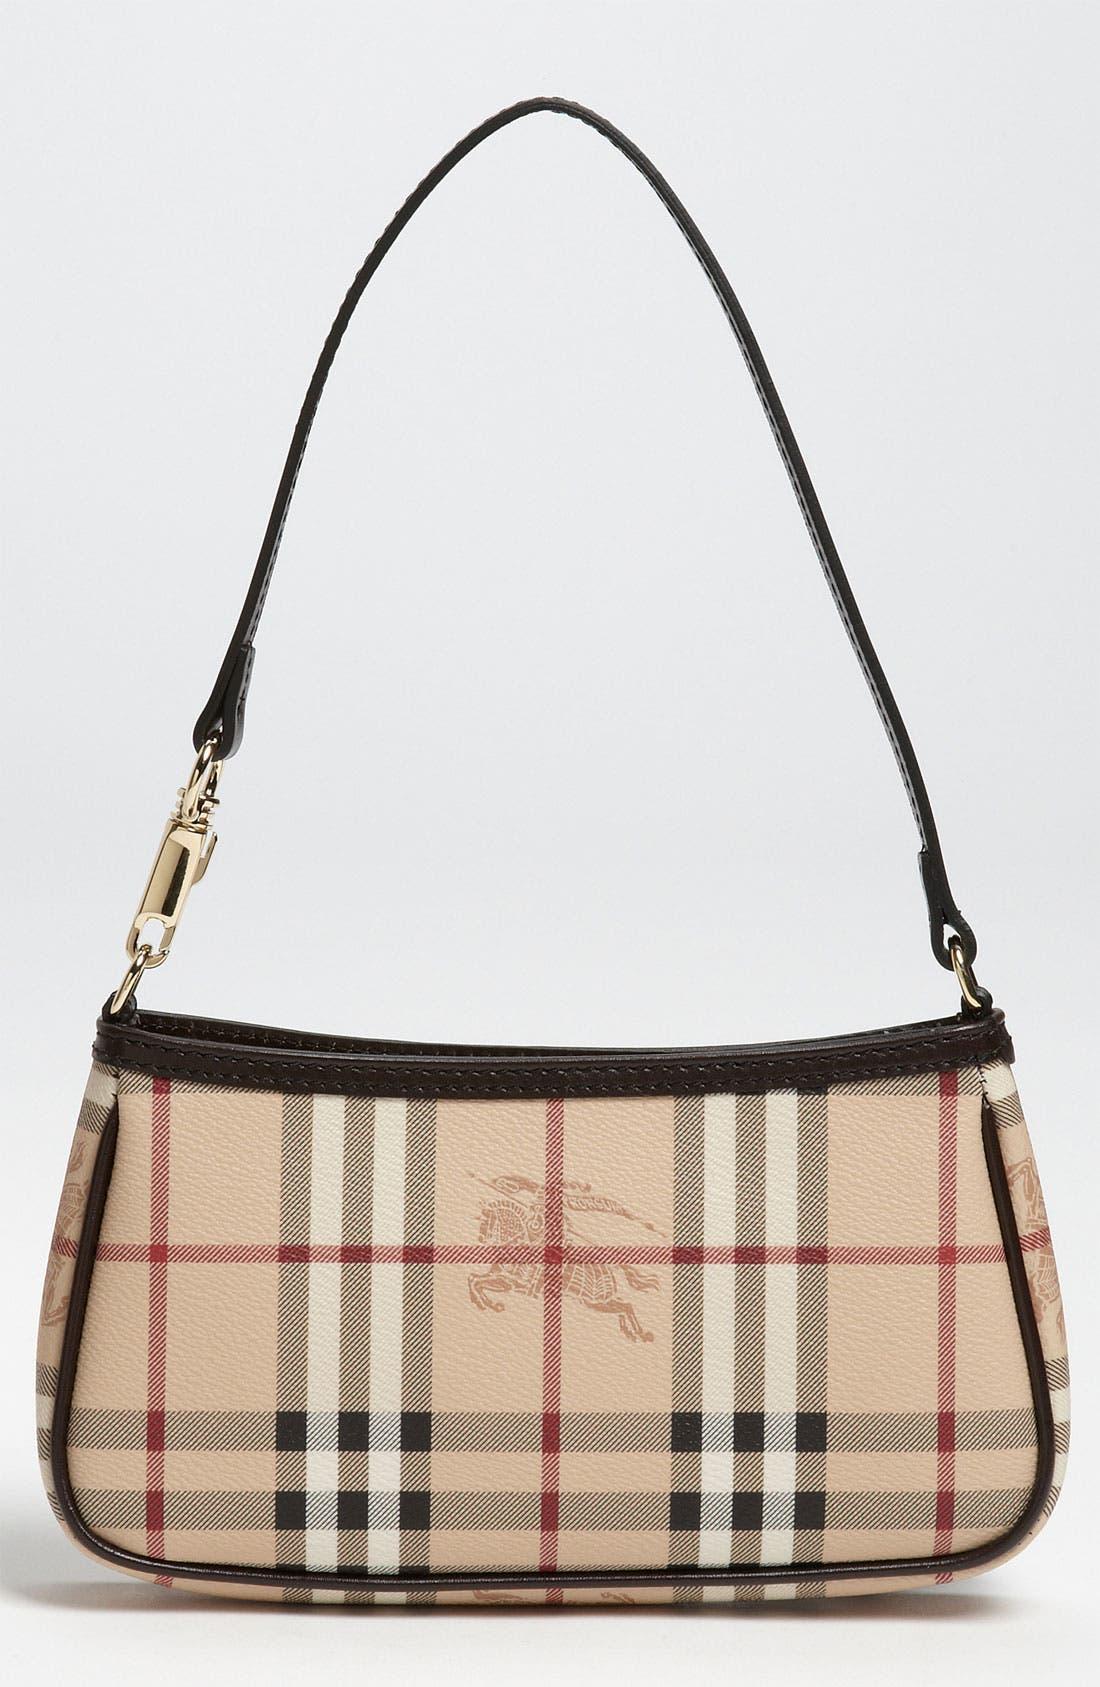 Main Image - Burberry 'Haymarket Check' Mini Shoulder Bag